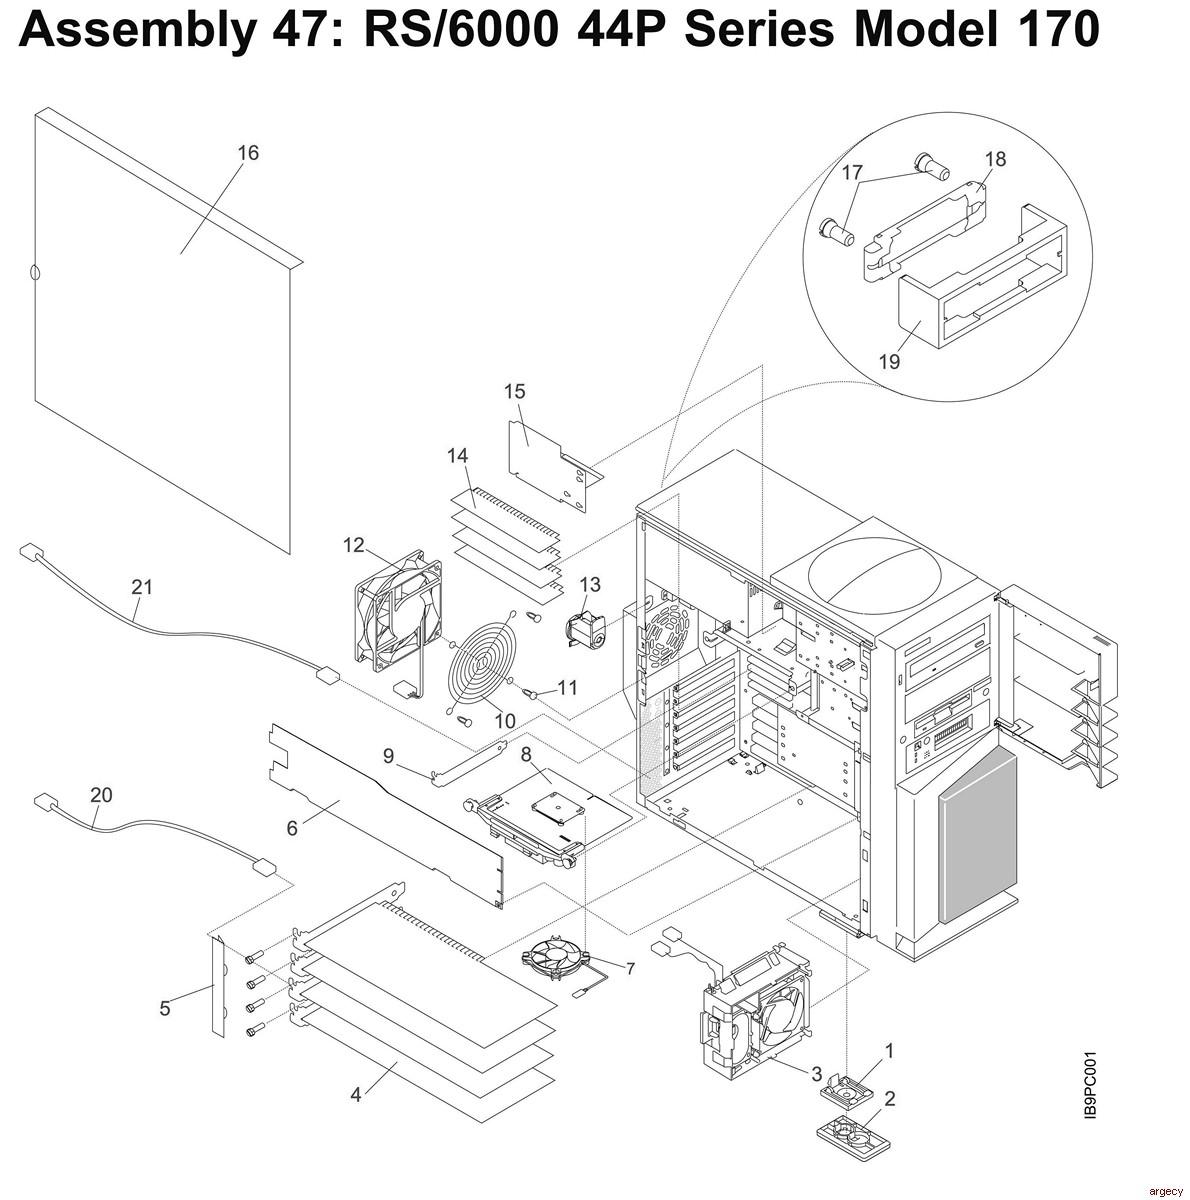 https://www.argecy.com/images/4000-parts-3409.jpg